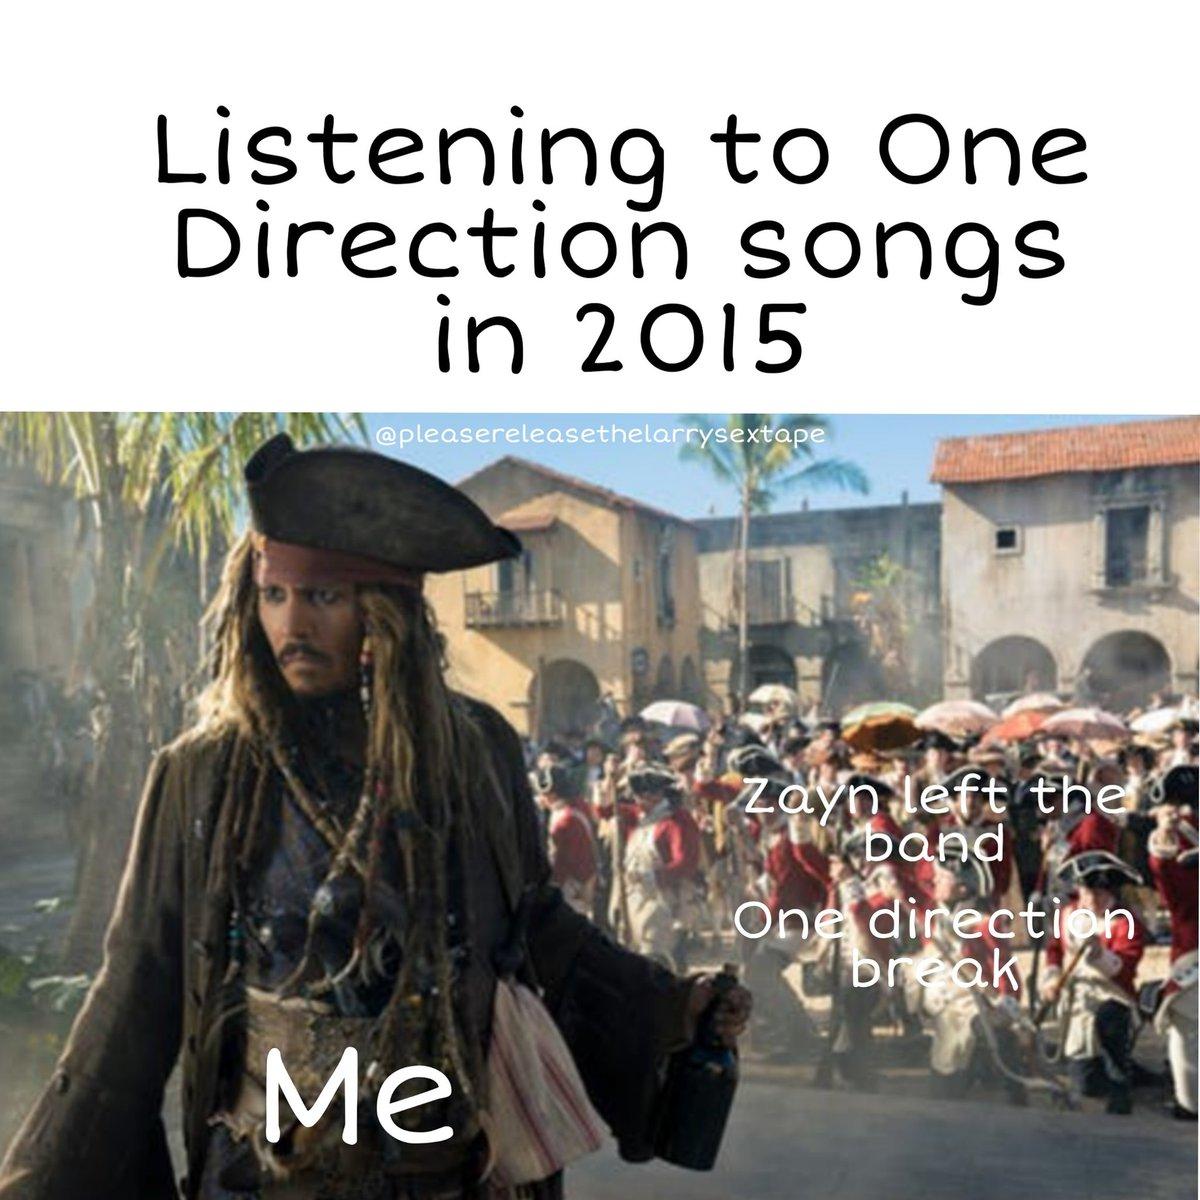 #onedirection #larryisreal #onedirectionmeme #loveislove #onedirectionmemes #onedirectionbreak #onedirectionhiatus #zaynmalik #liampayne #fuckcorona #depressed #memes #meme #niallhoran #harrystyles #larrystylinson #louistomlinson #28pic.twitter.com/RSTf2OVddJ